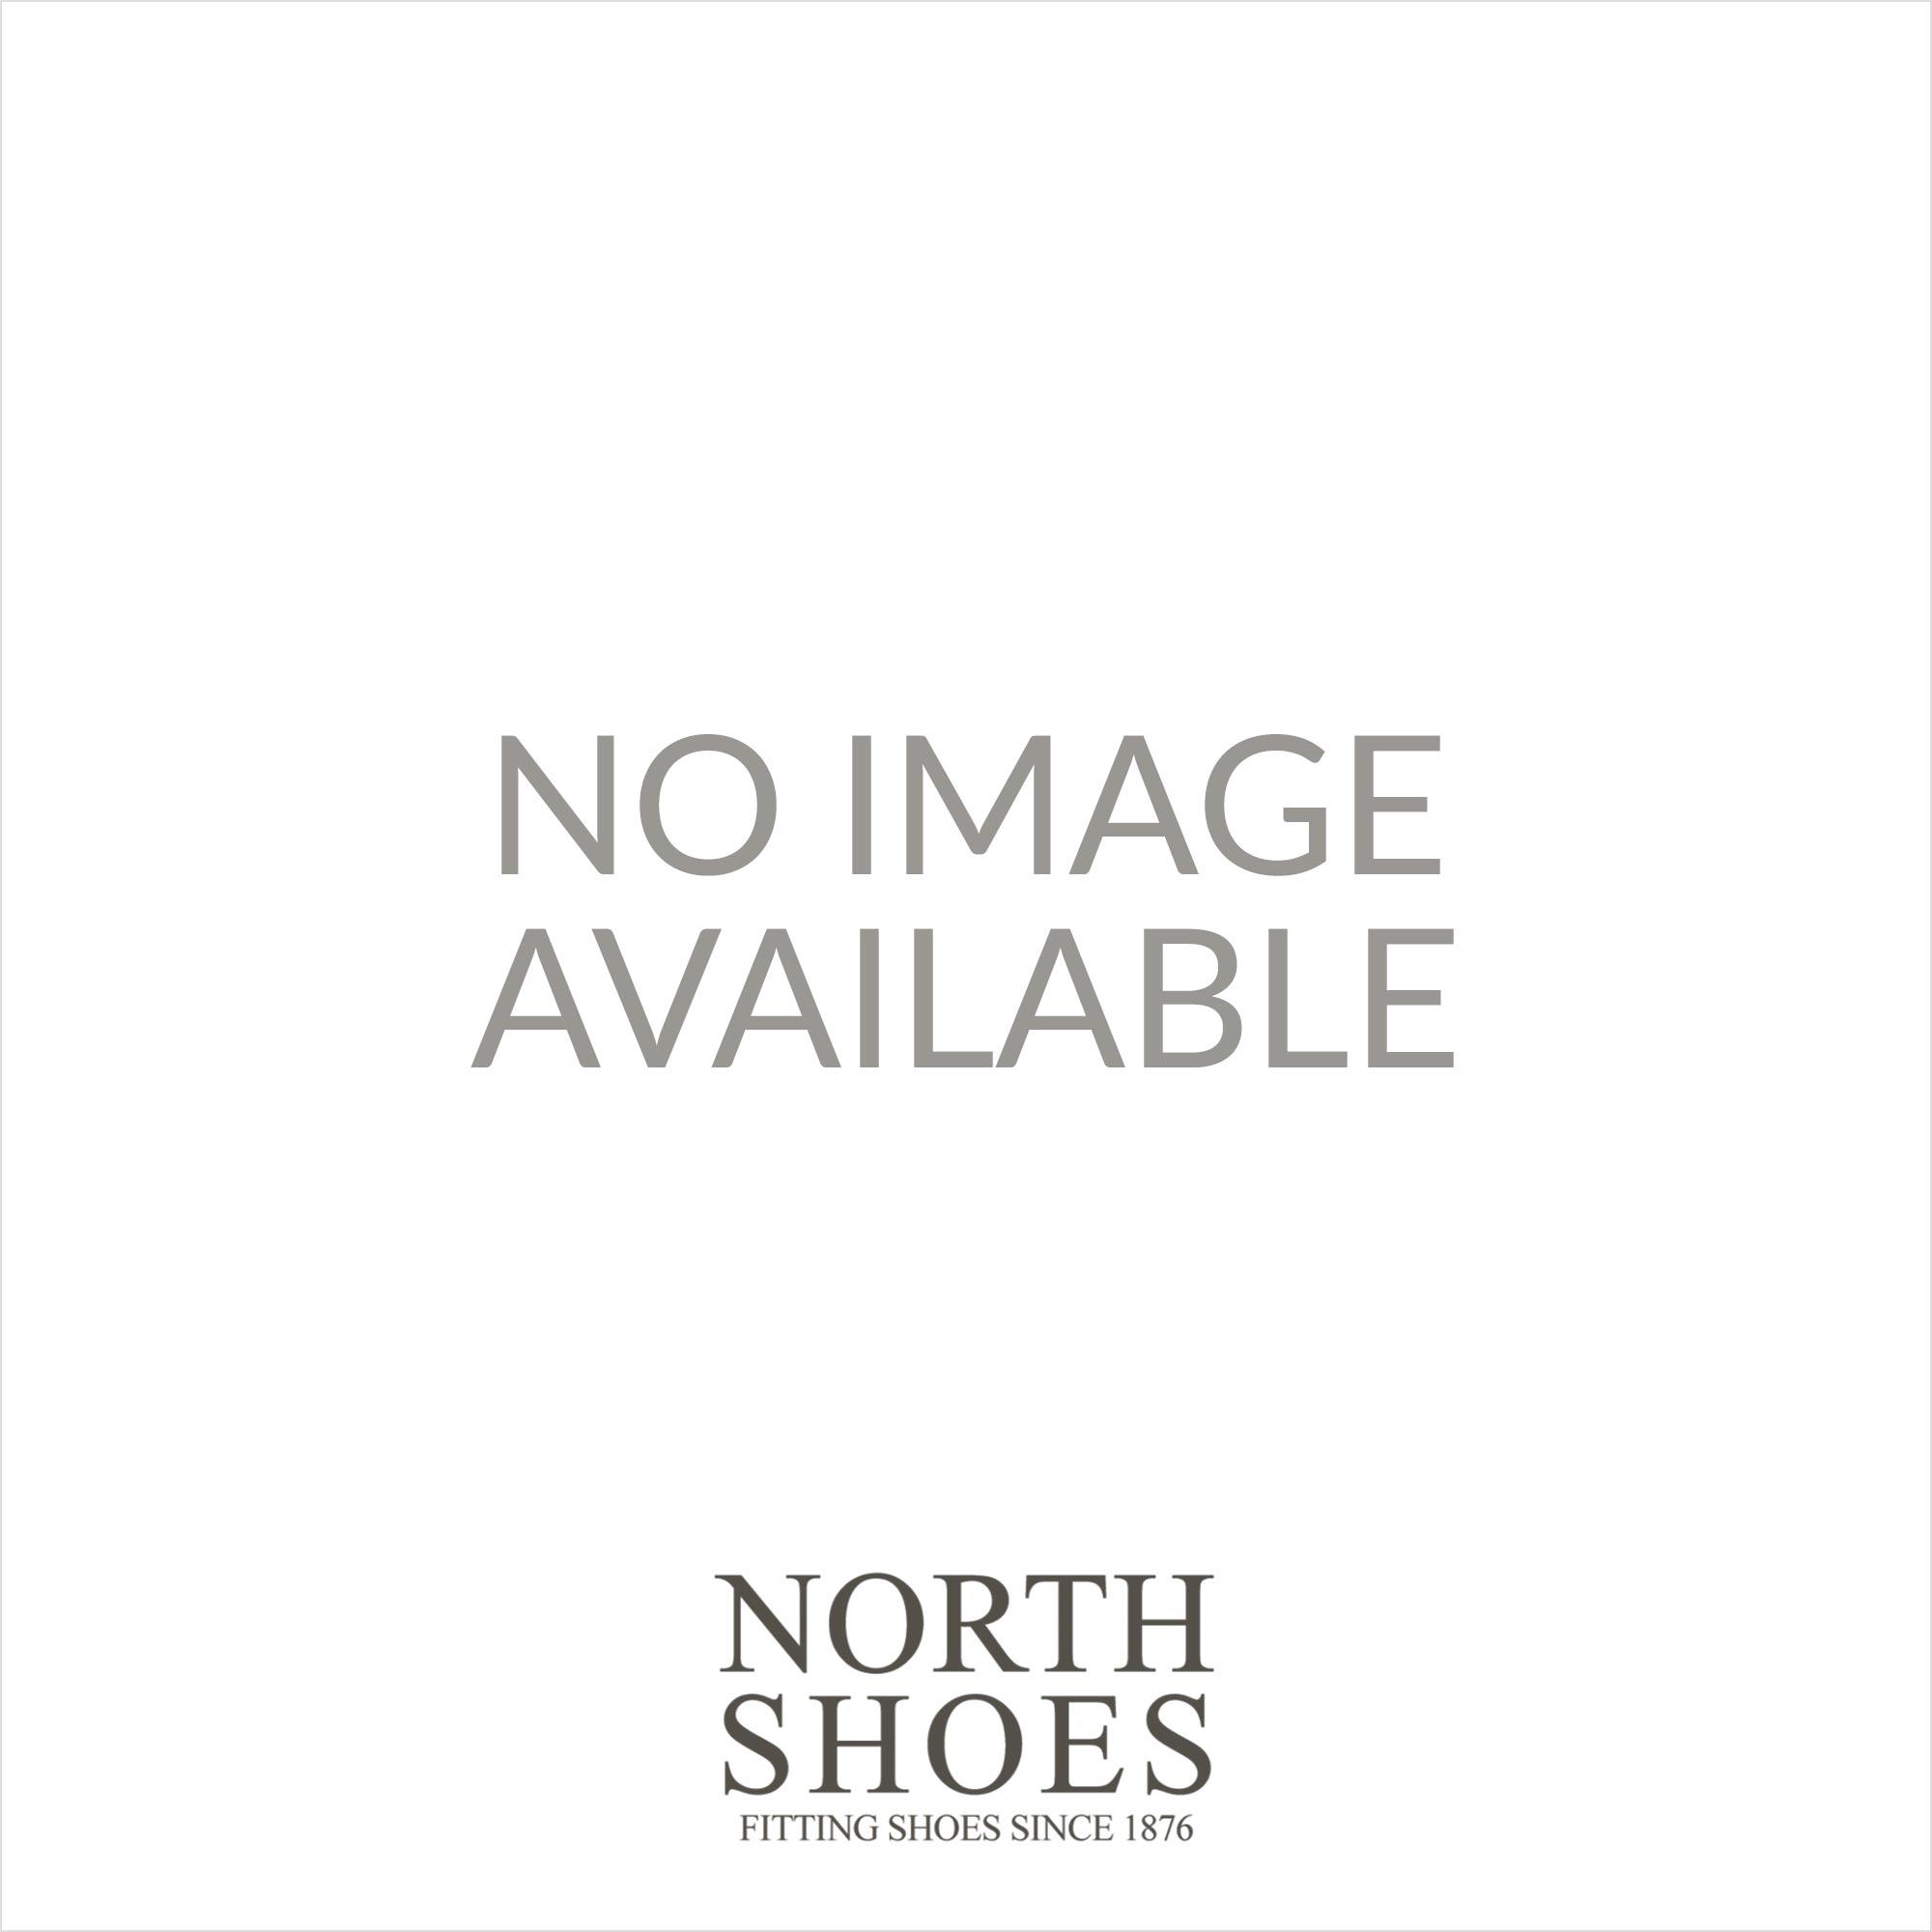 644f3de4 Ayla Low Black Suede Leather Womens Slip On Ballet Pump Shoes